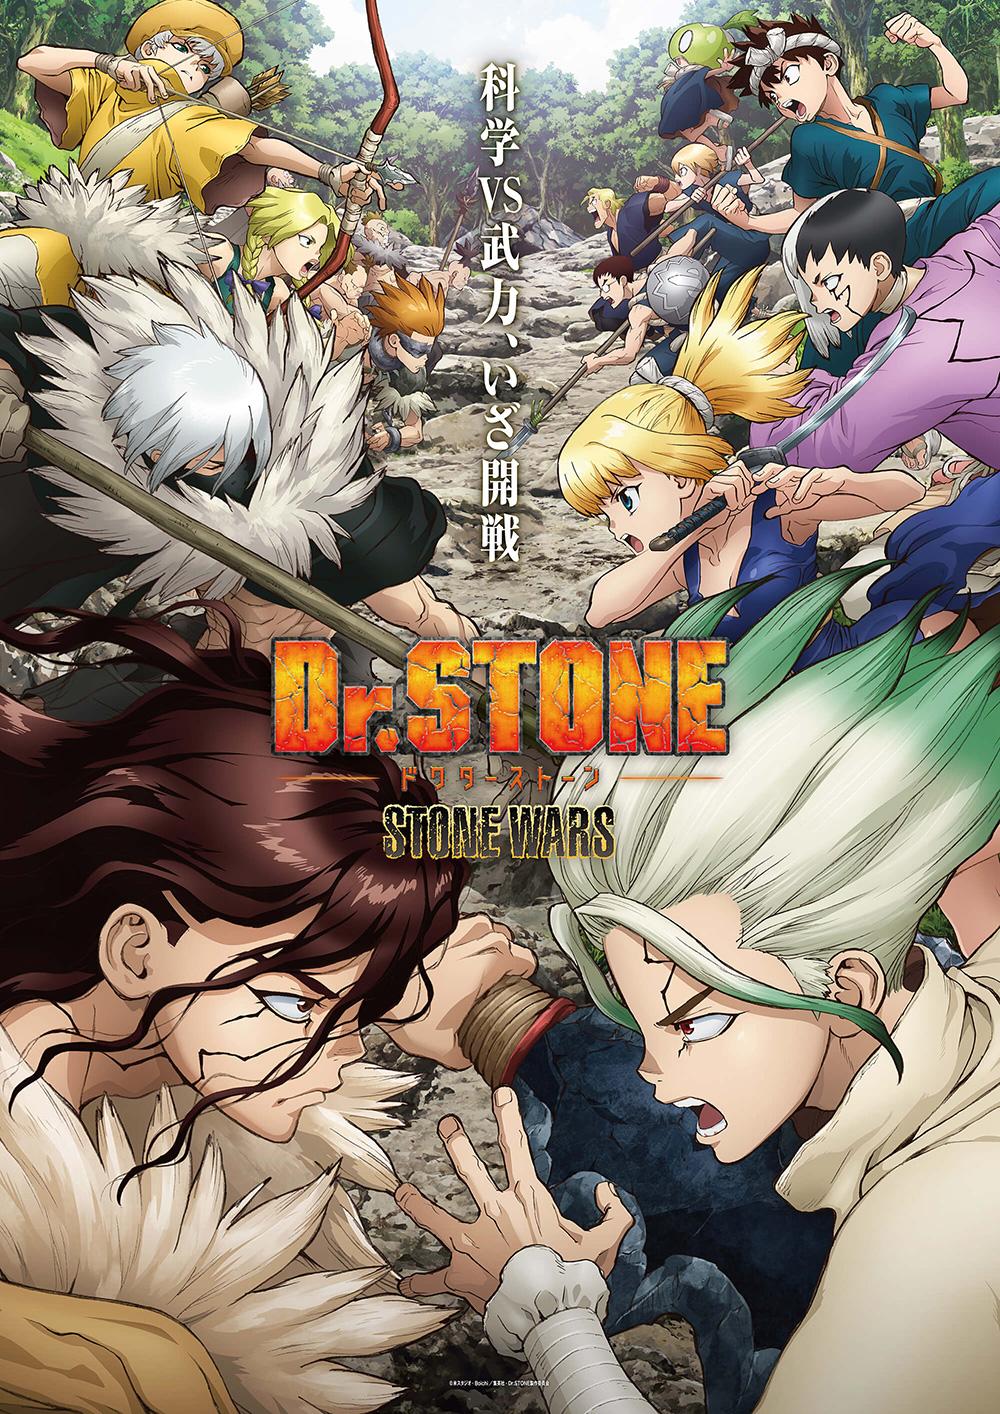 Dr.-Stone-Stone-Wars-Visual-02